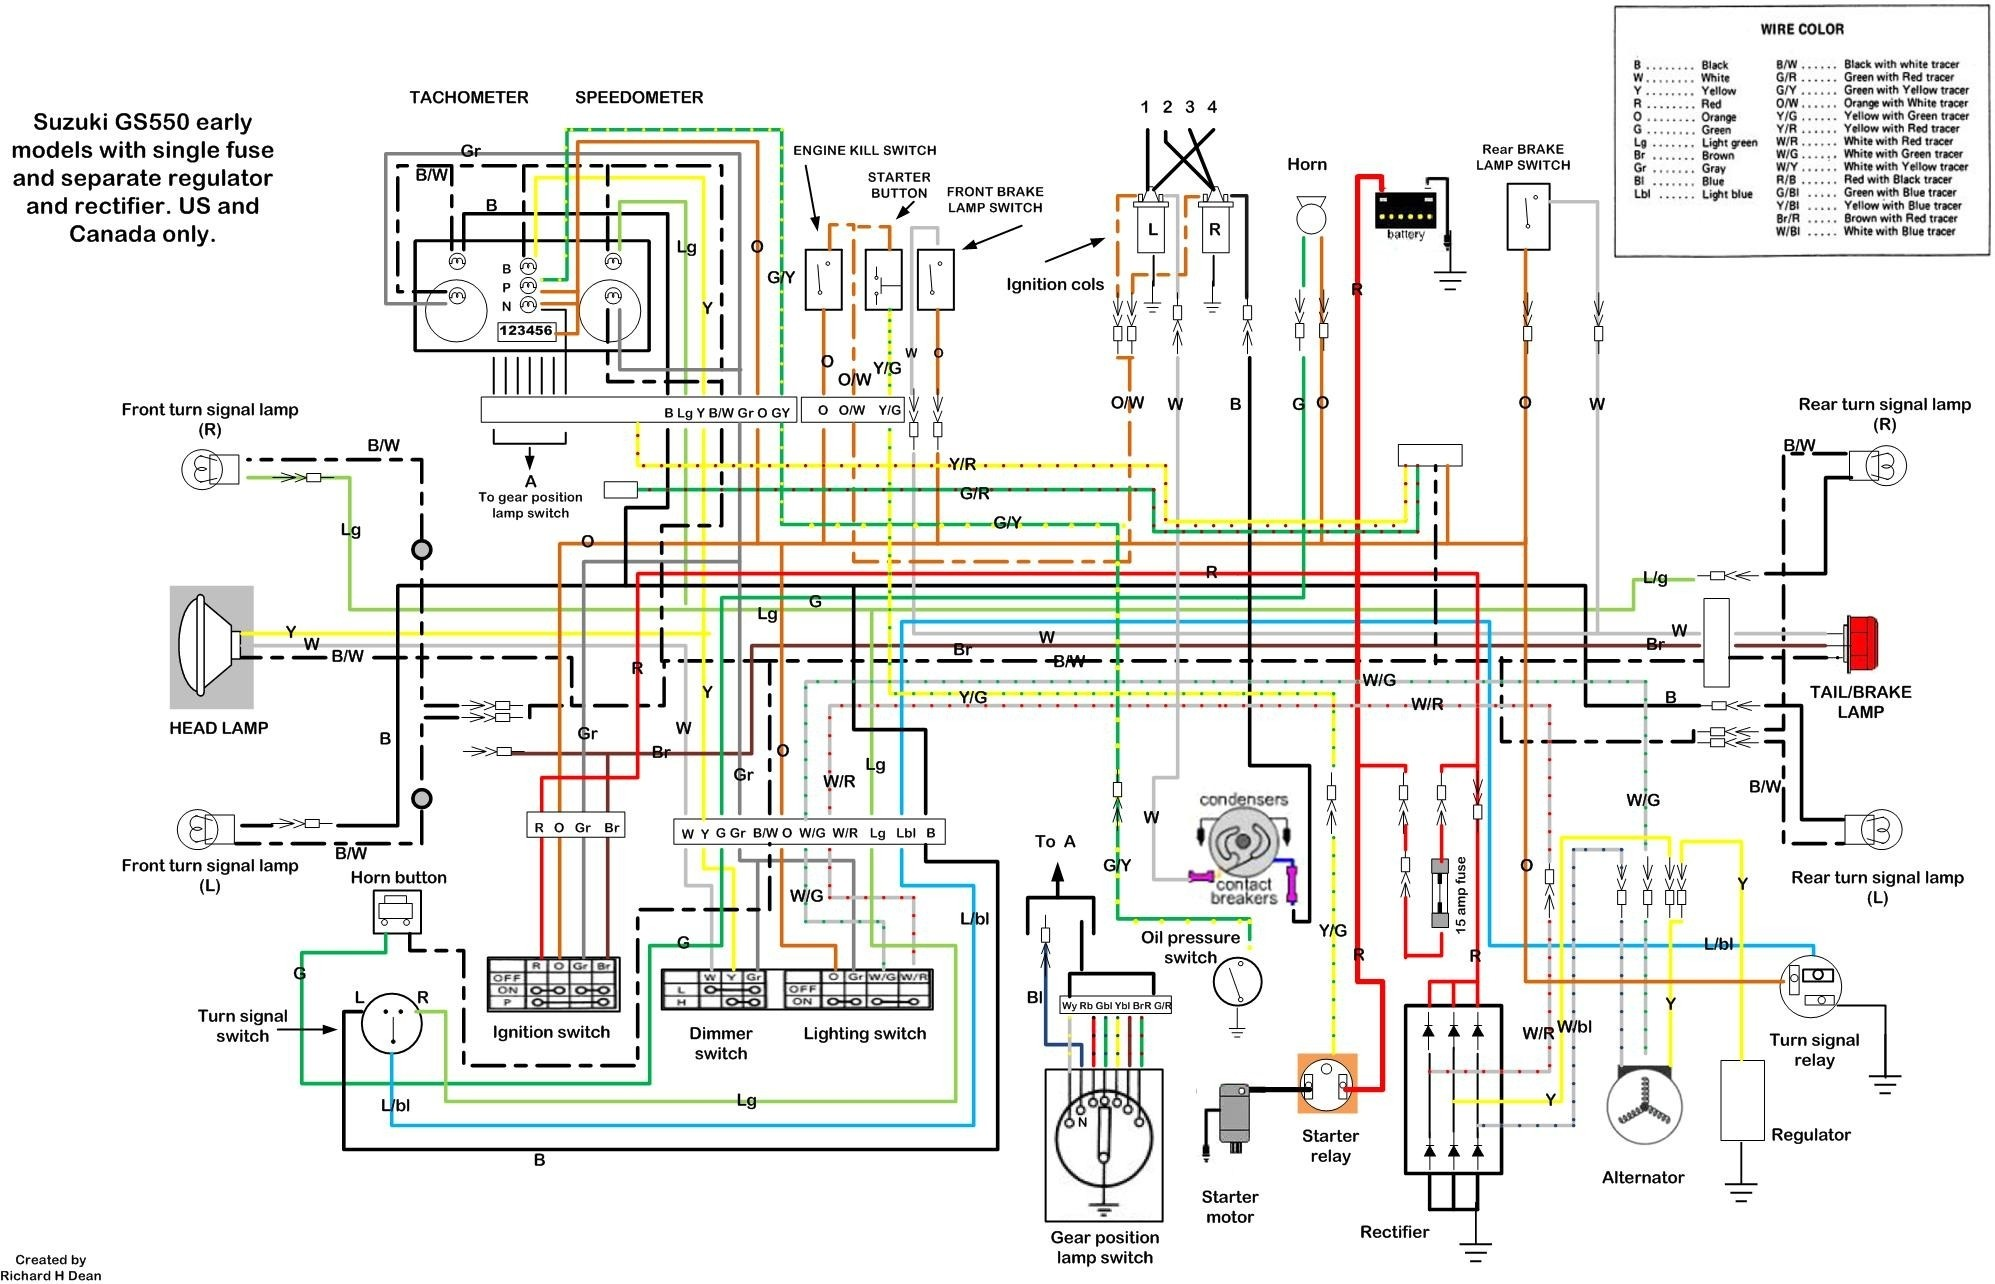 2006 Bass Tracker Wiring Diagram And Ebooks 1980 B Schematic Source Rh 7 5 3 Logistra Net De Harness